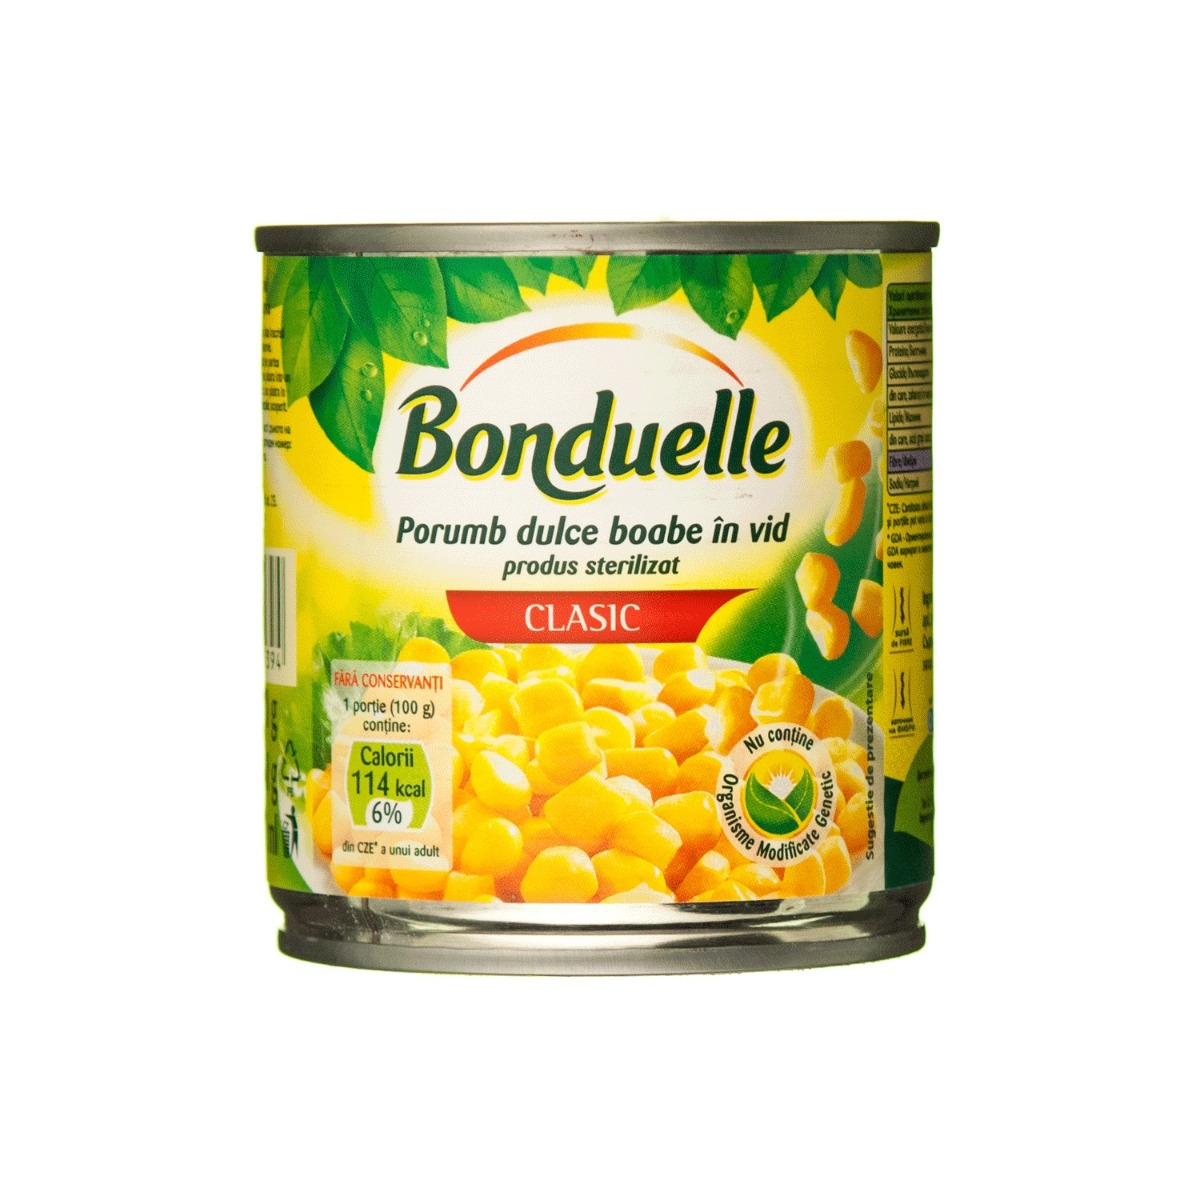 Porumb dulce Bonduelle, 170 g